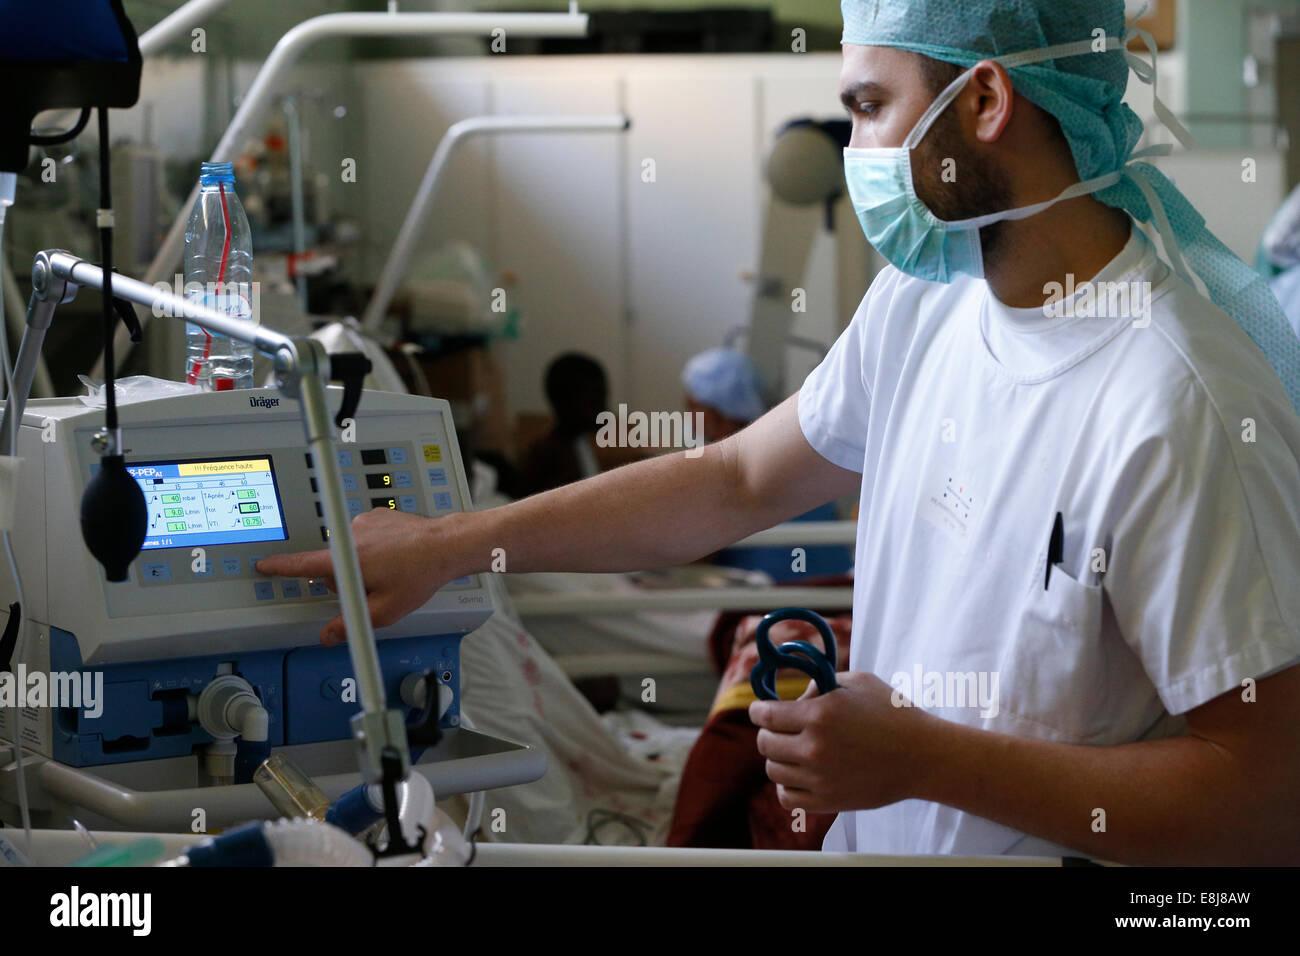 "Brazzaville Hospital. NGO la Cha""ne de l'Espoir. Intensive care. - Stock Image"